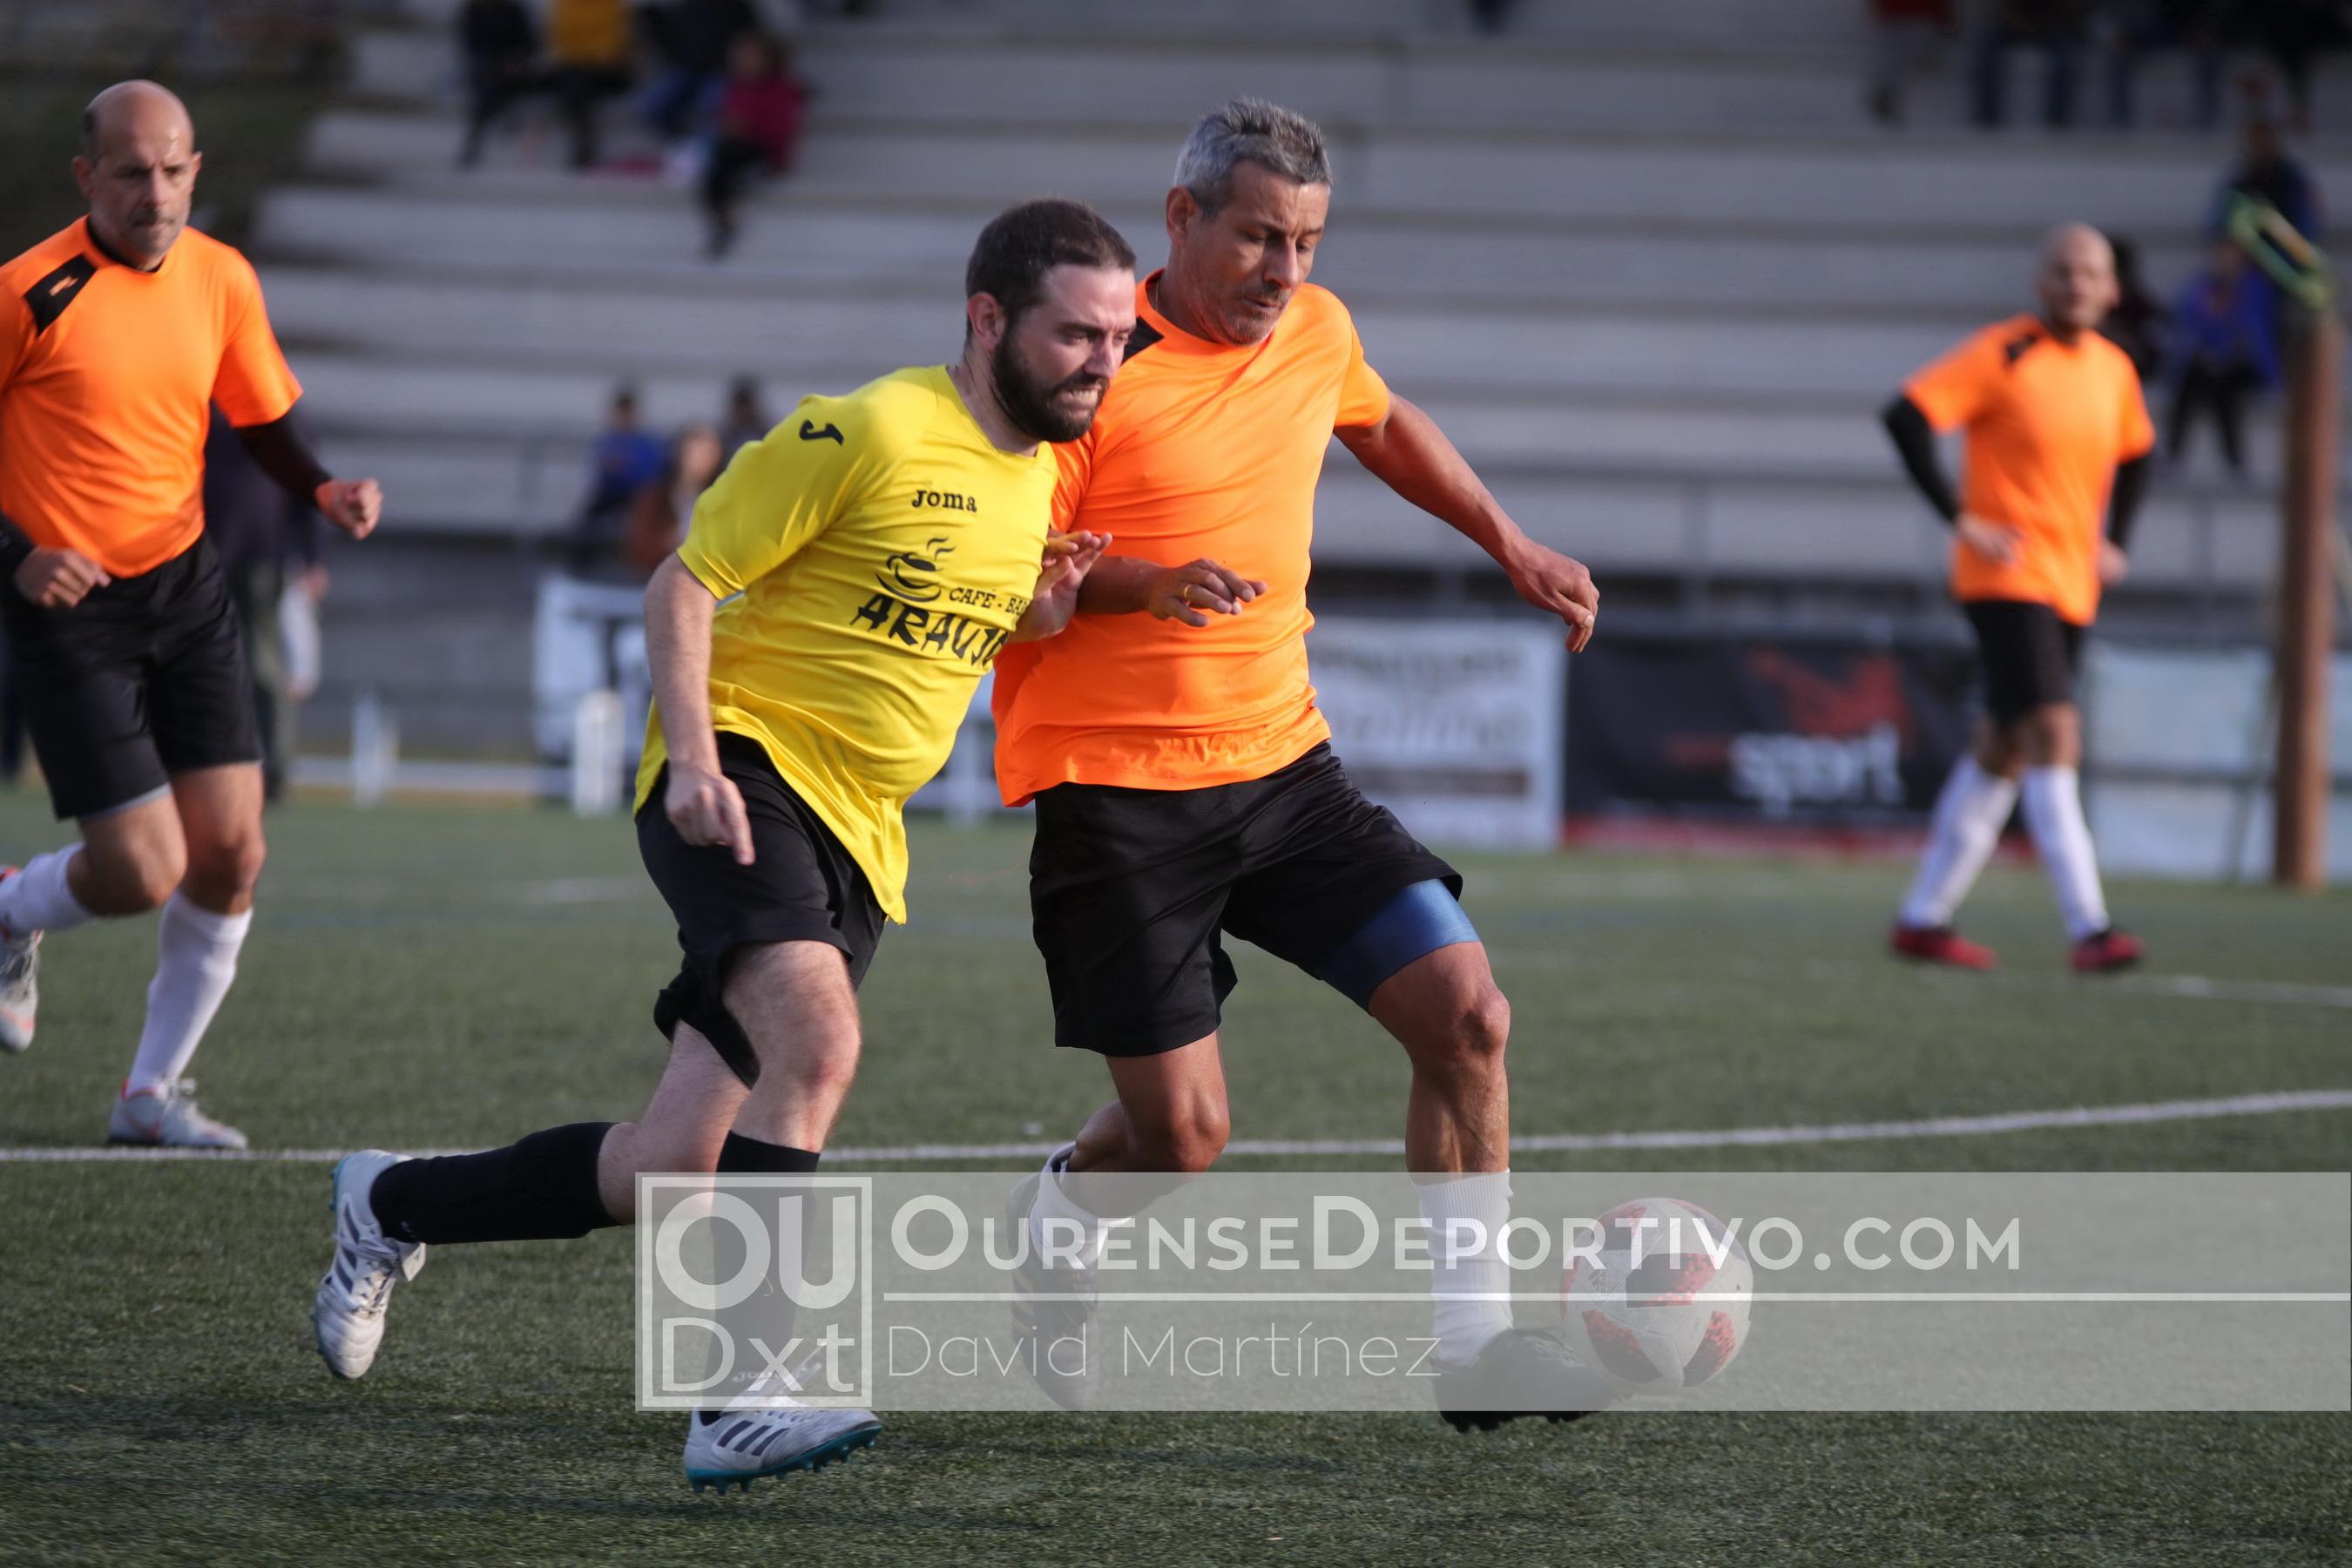 ourensedeportivo_david_martinez (39)